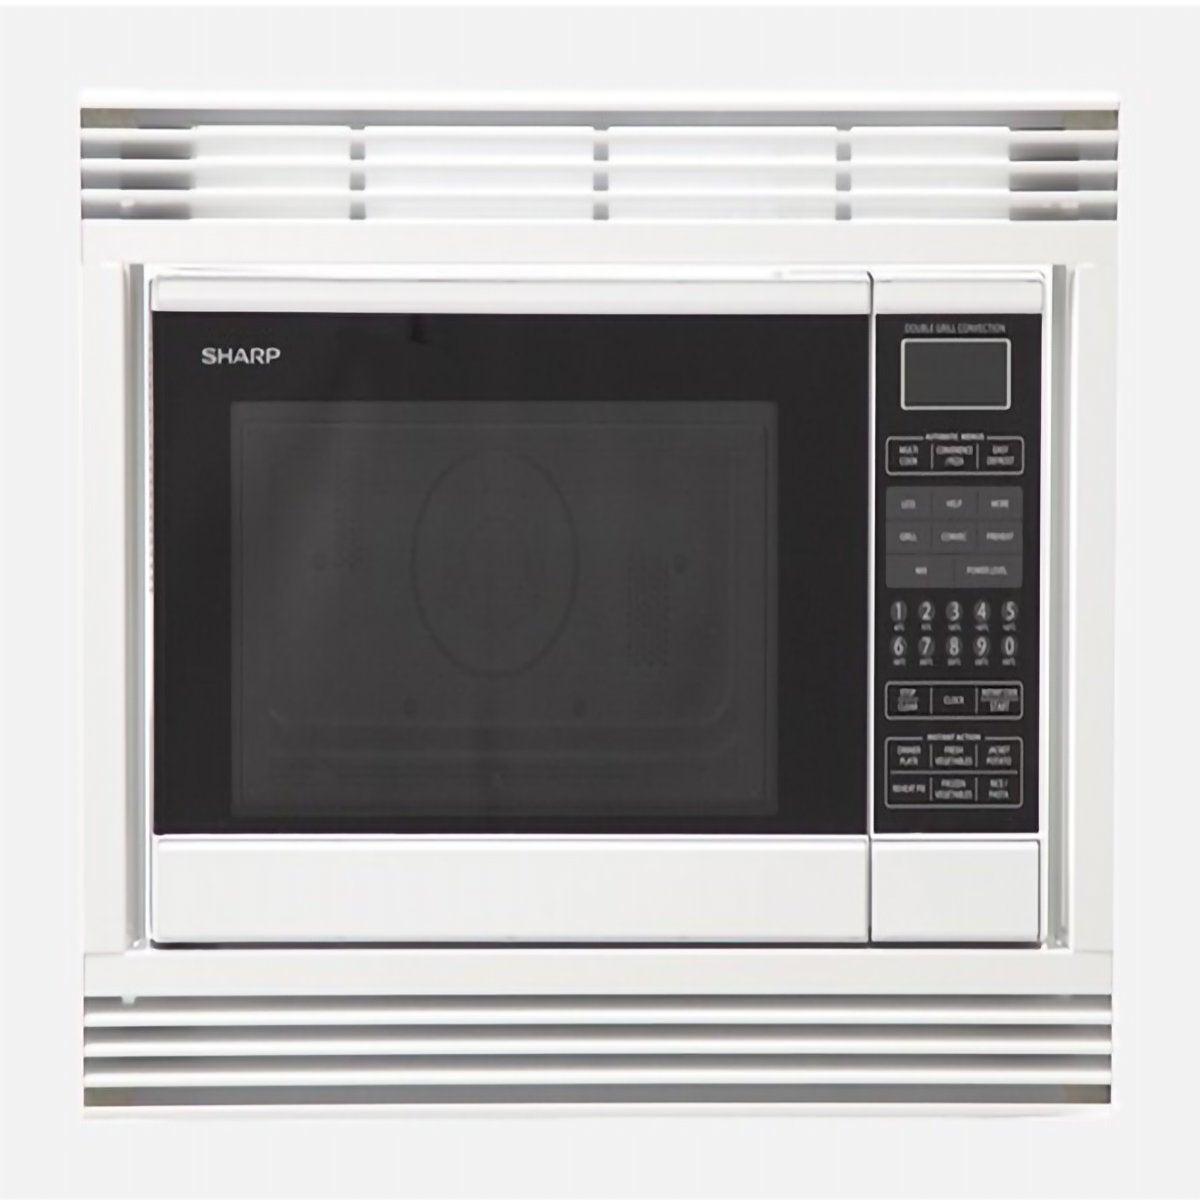 Sharp EBR5000W Microwave